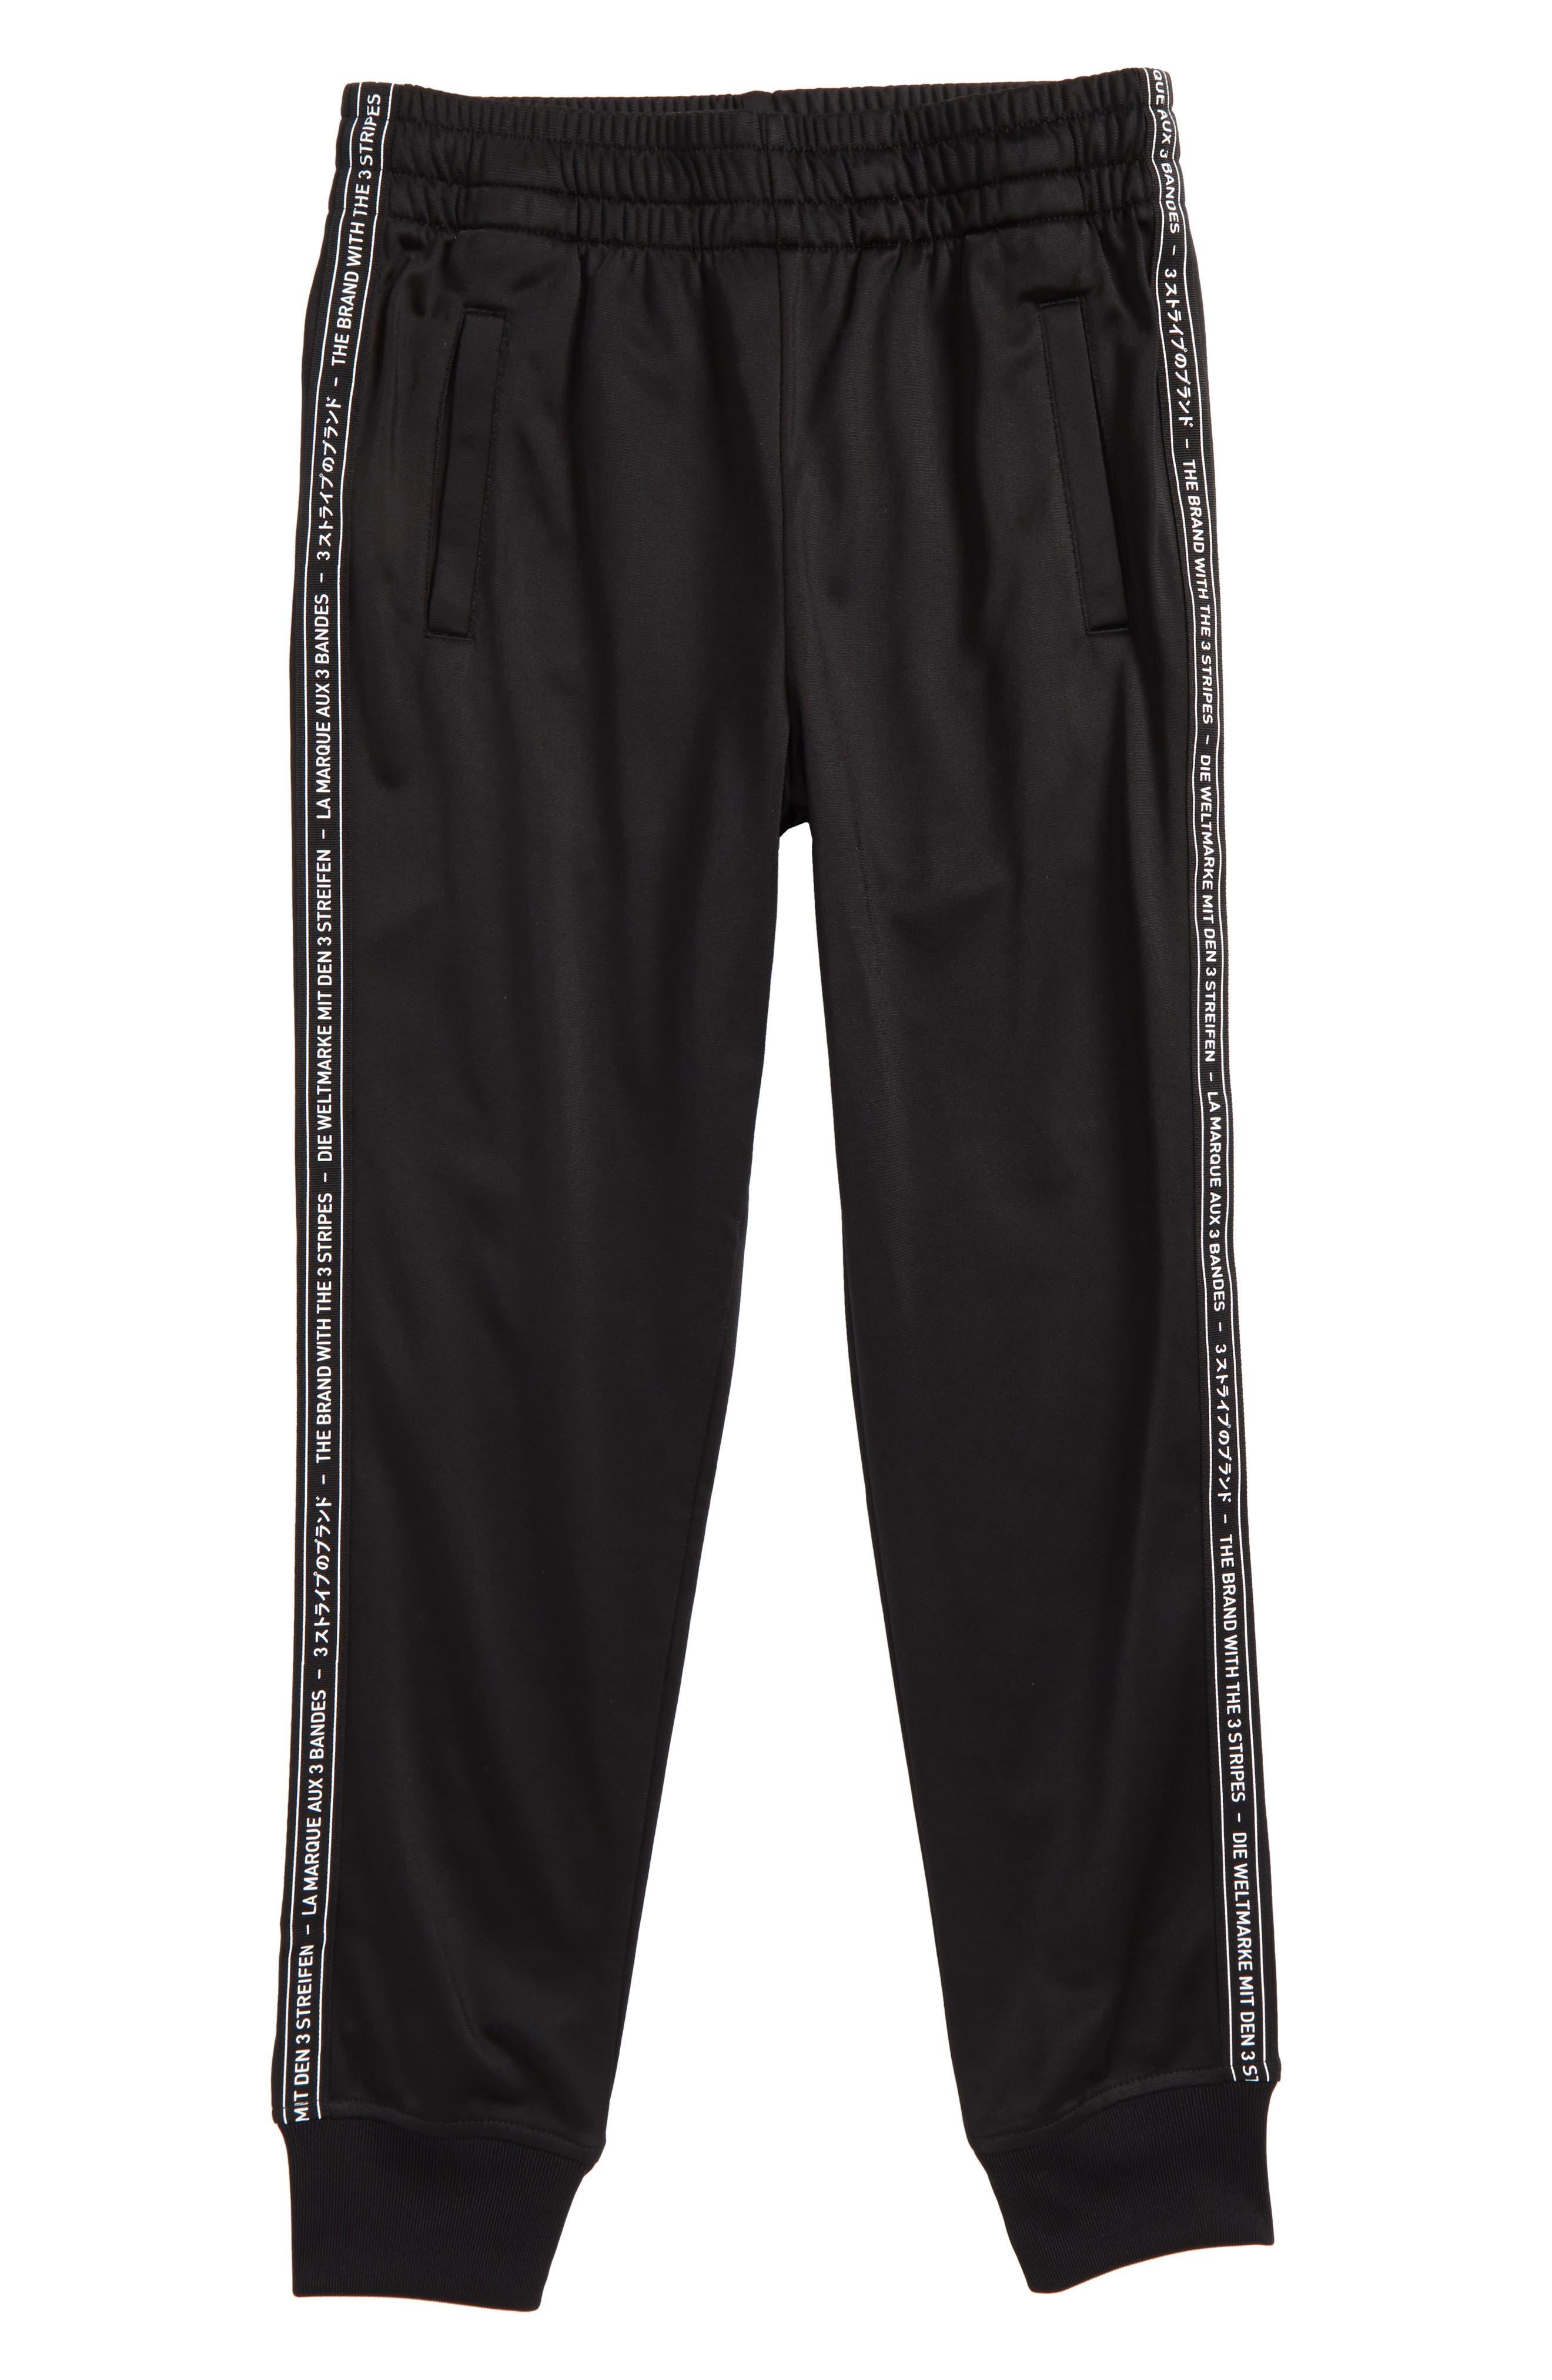 Main Image - adidas Originals Superstar Tiro Track Pants (Little Boys & Big Boys)